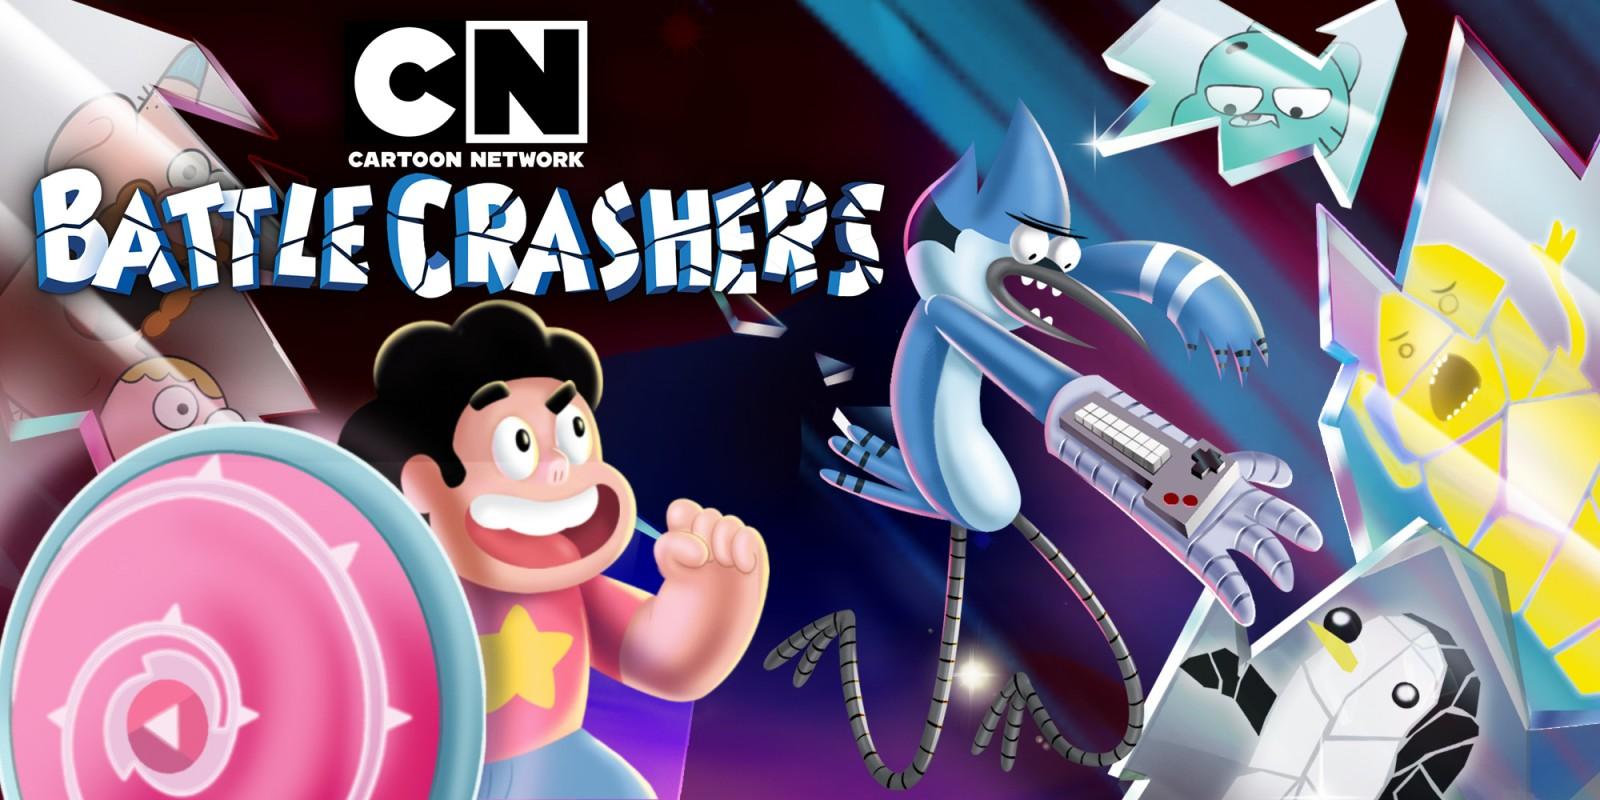 [TEST] Cartoon Network: Battle Crashers sur Nintendo Switch